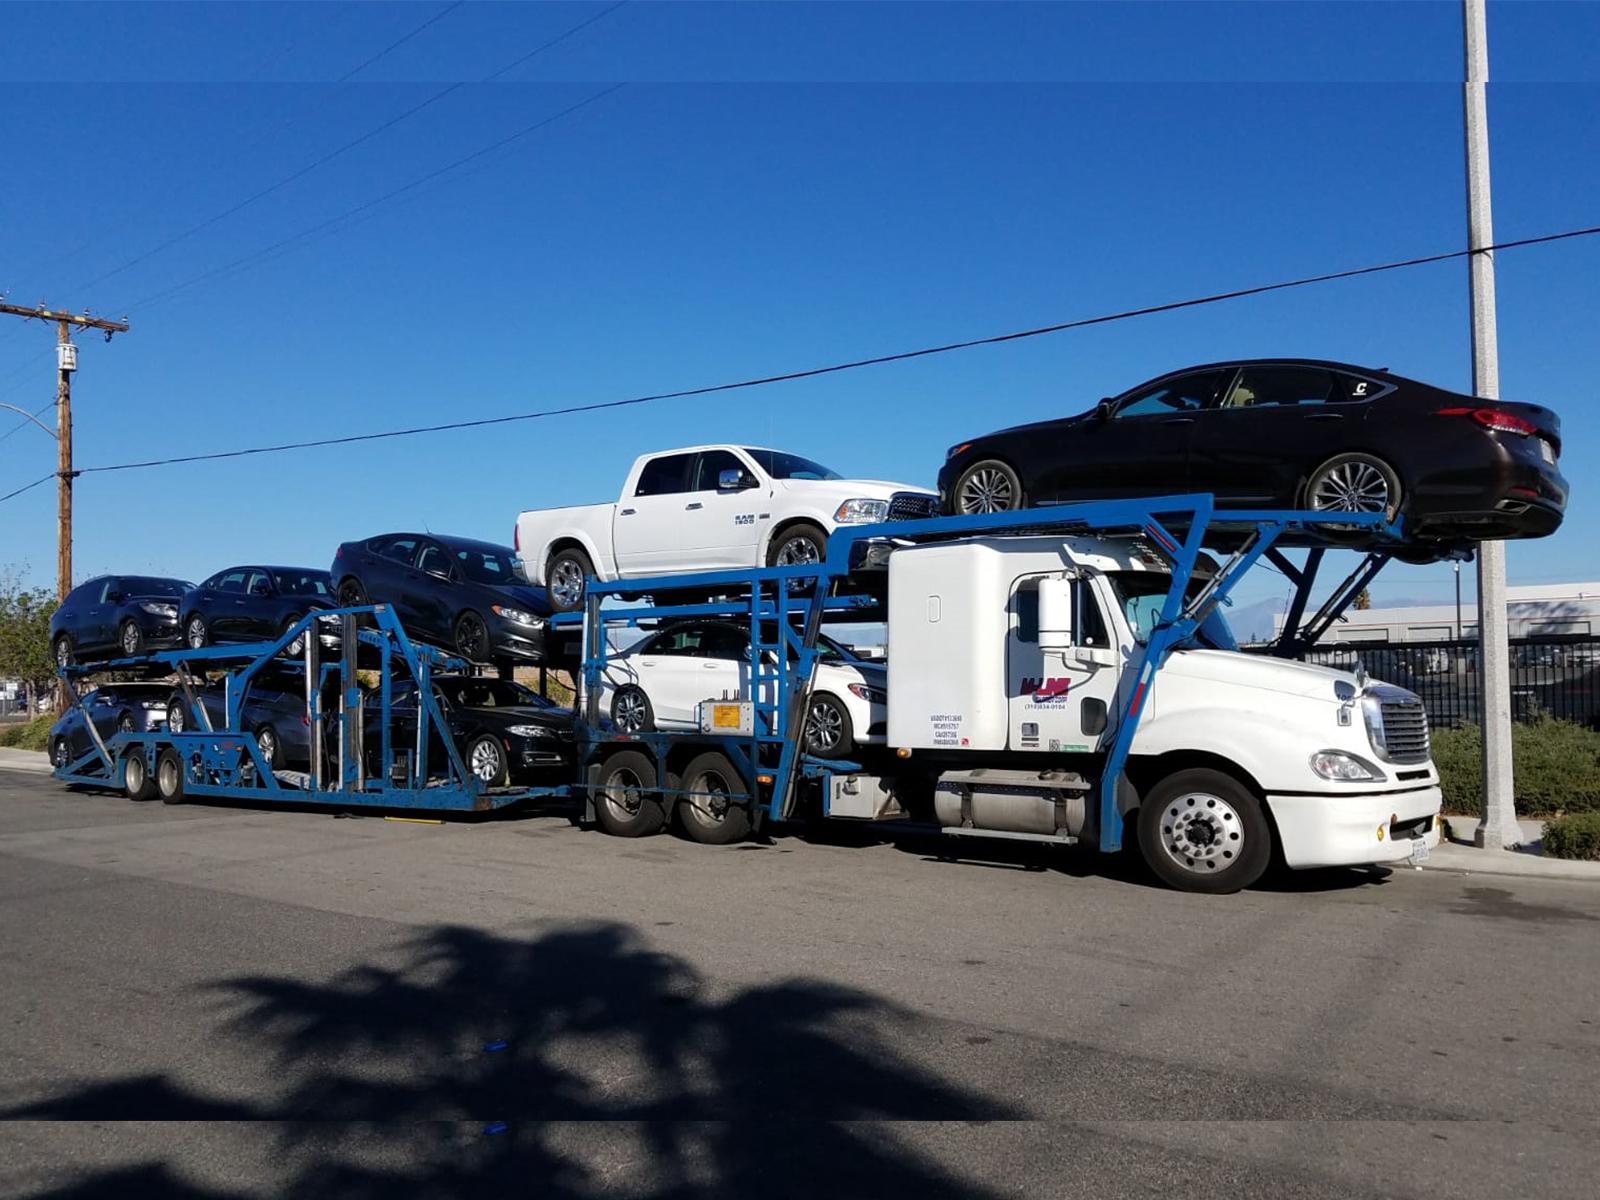 hight resolution of 2010 frht columbia w 9 car auto hauler